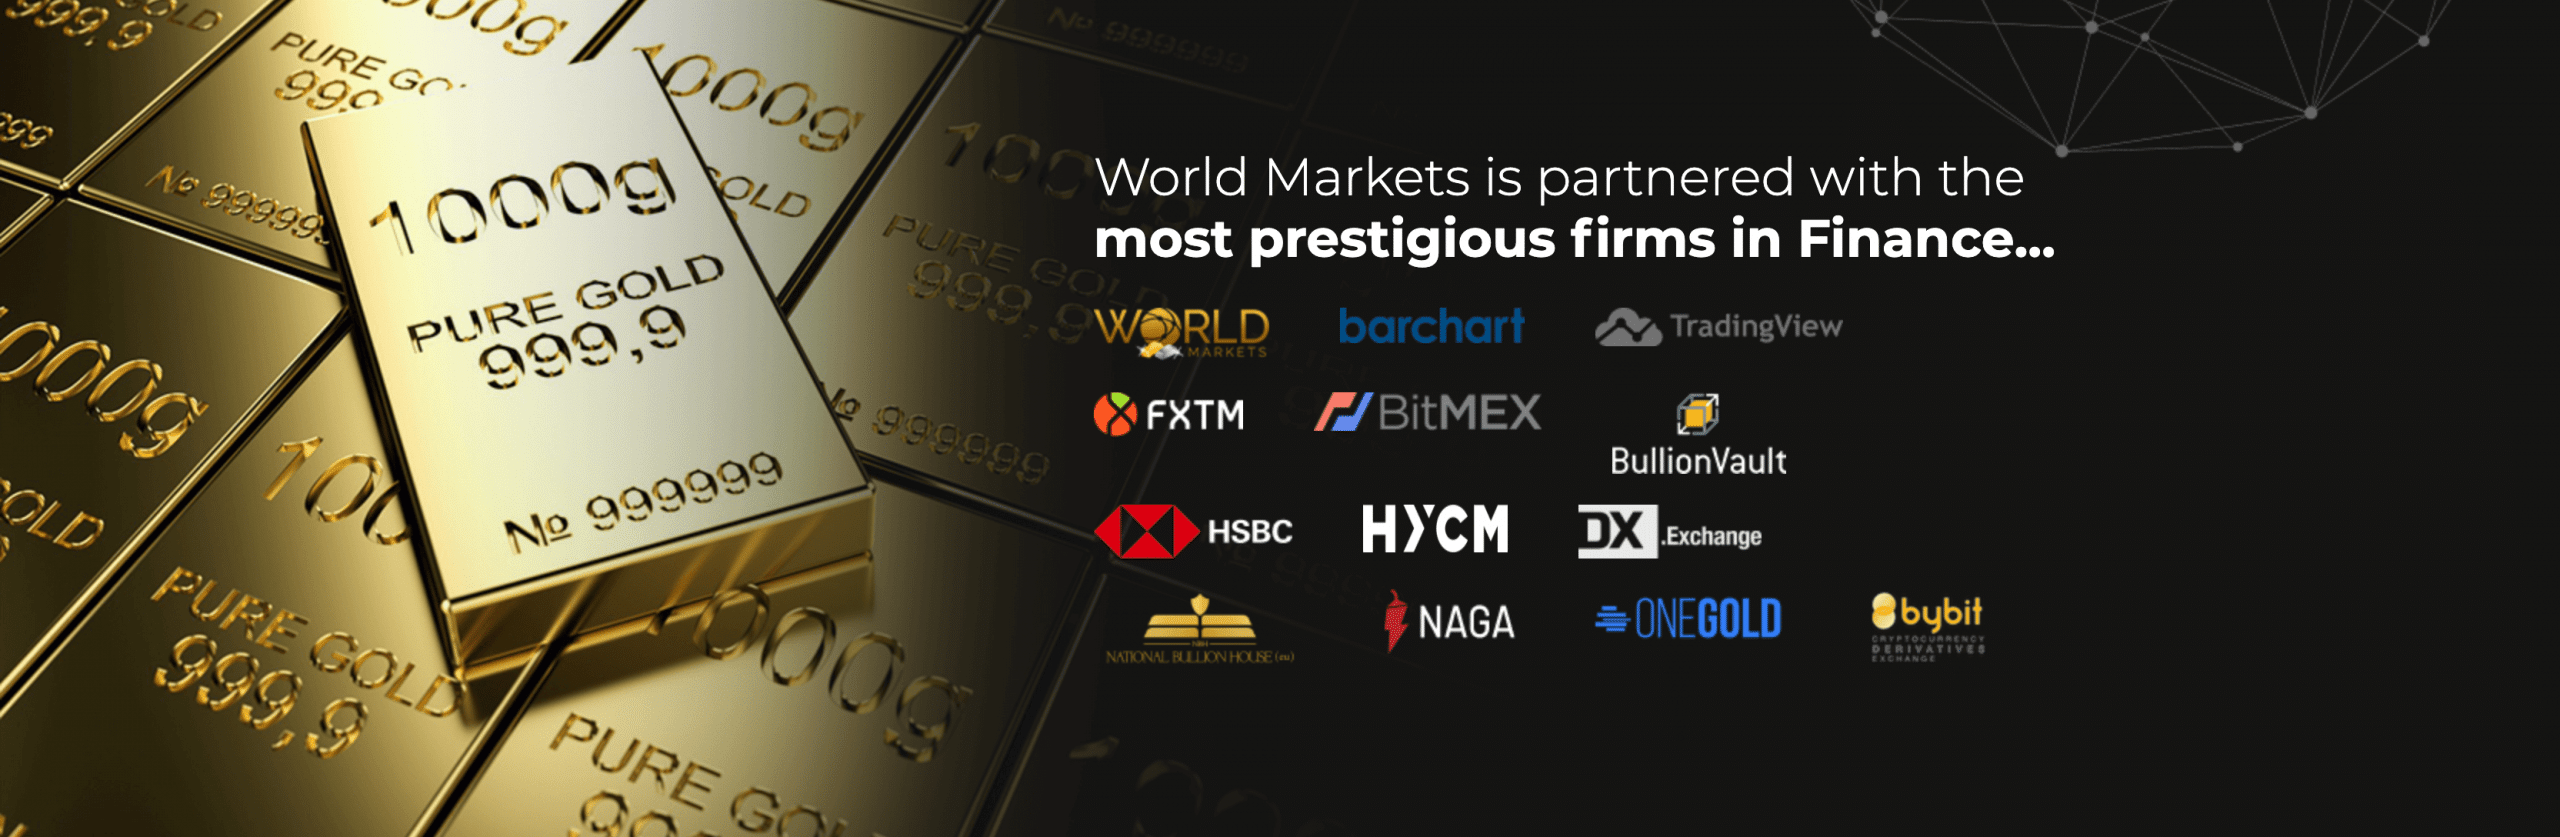 Worldmarkets Partner